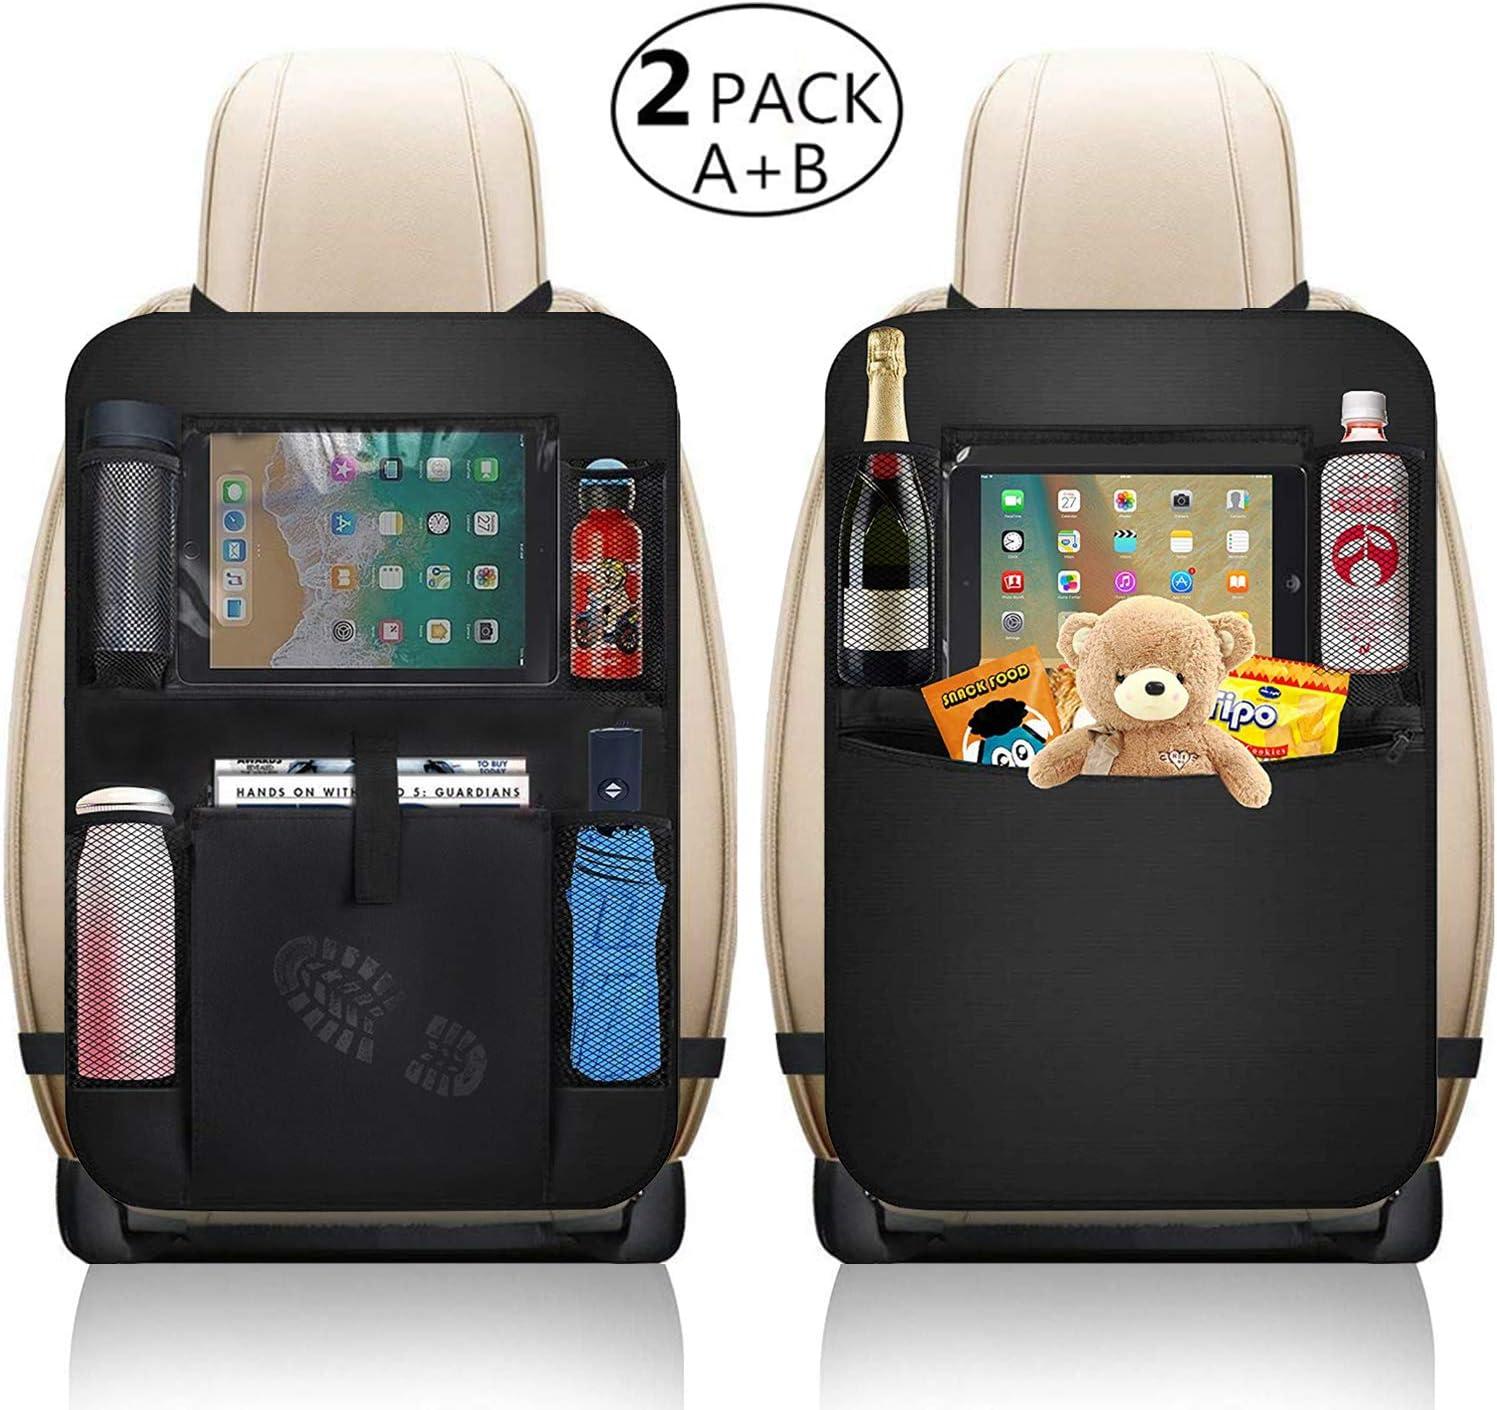 Car Seat Rear Kids Kick Protector Organizer Travel Vehicle SUV pockets black NEW